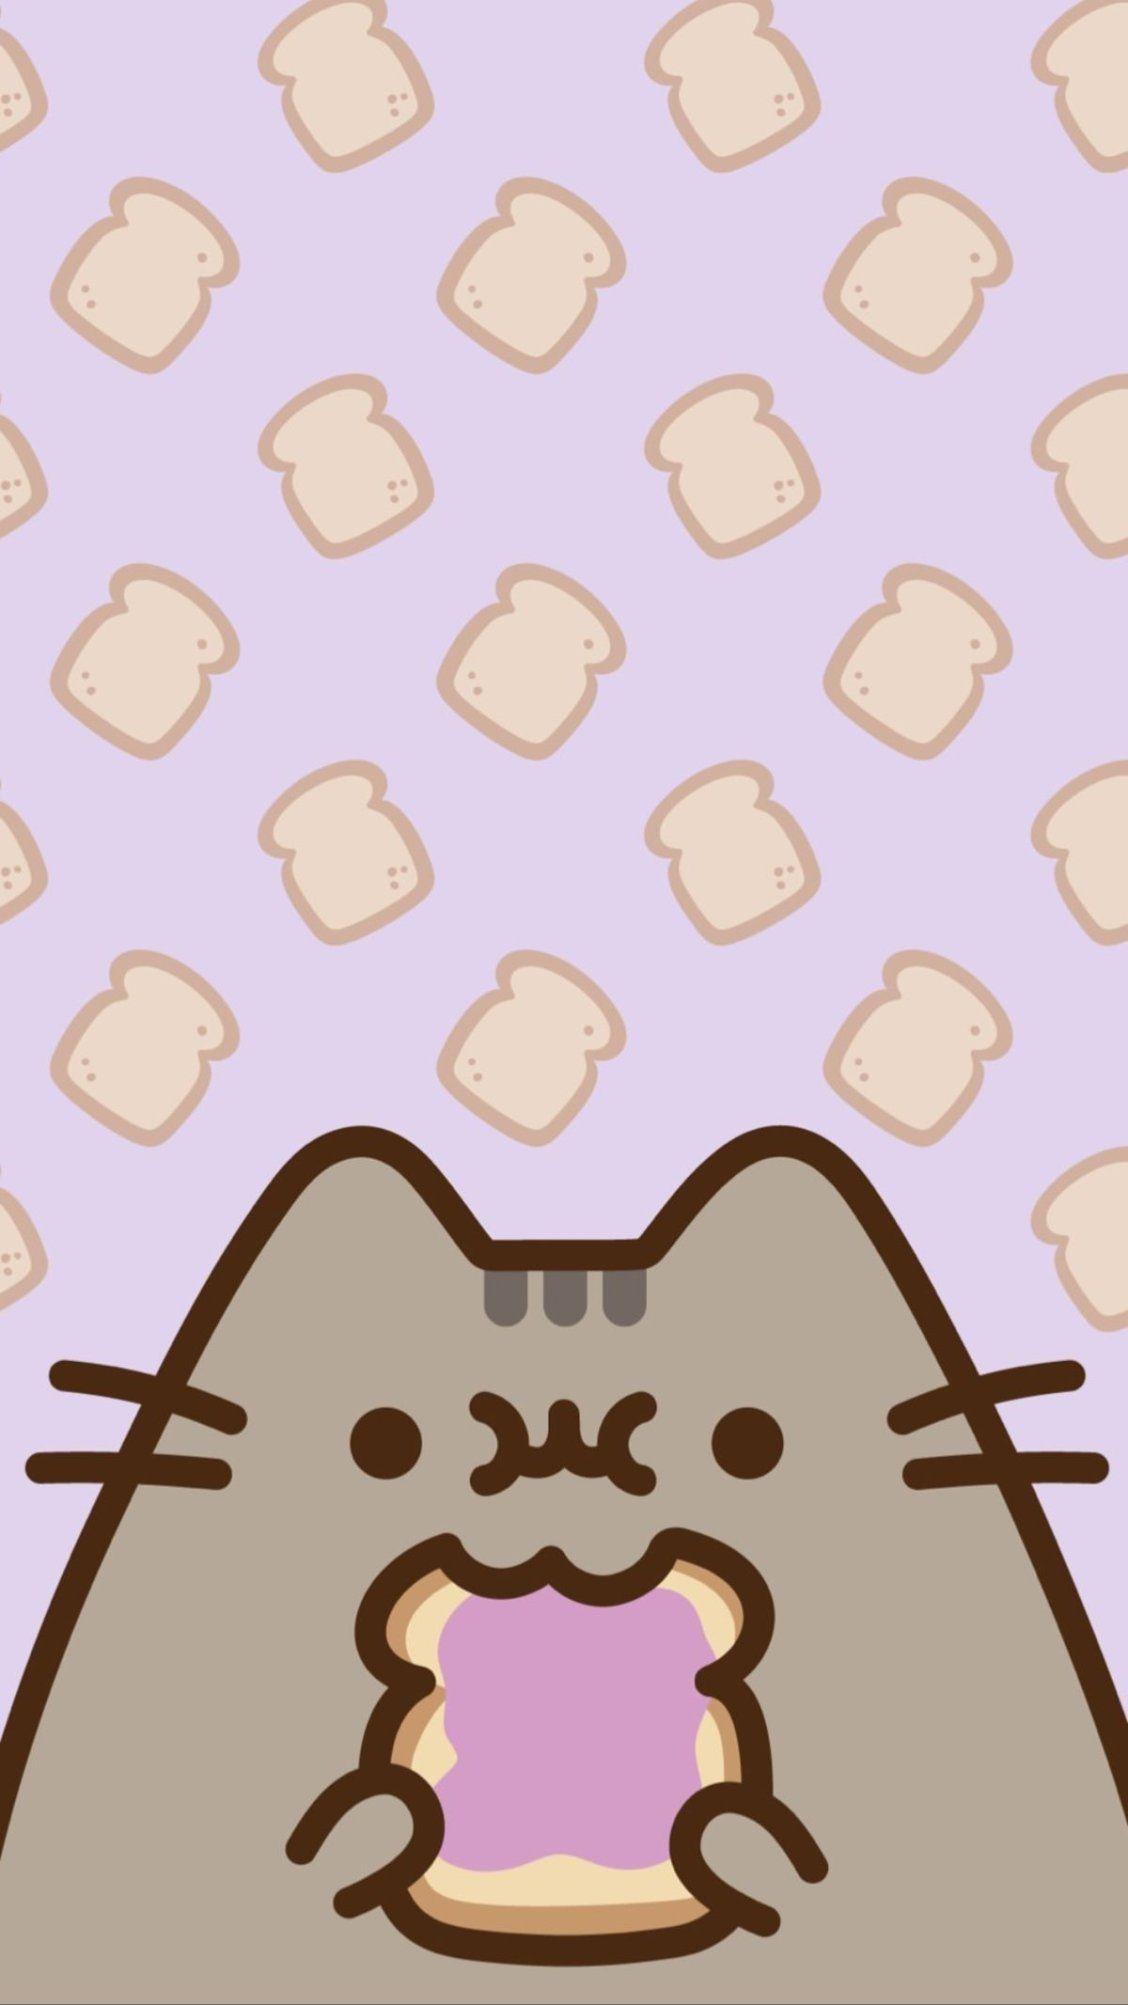 Tall Toast Pusheen Cute Pusheen Cat Kawaii Wallpaper